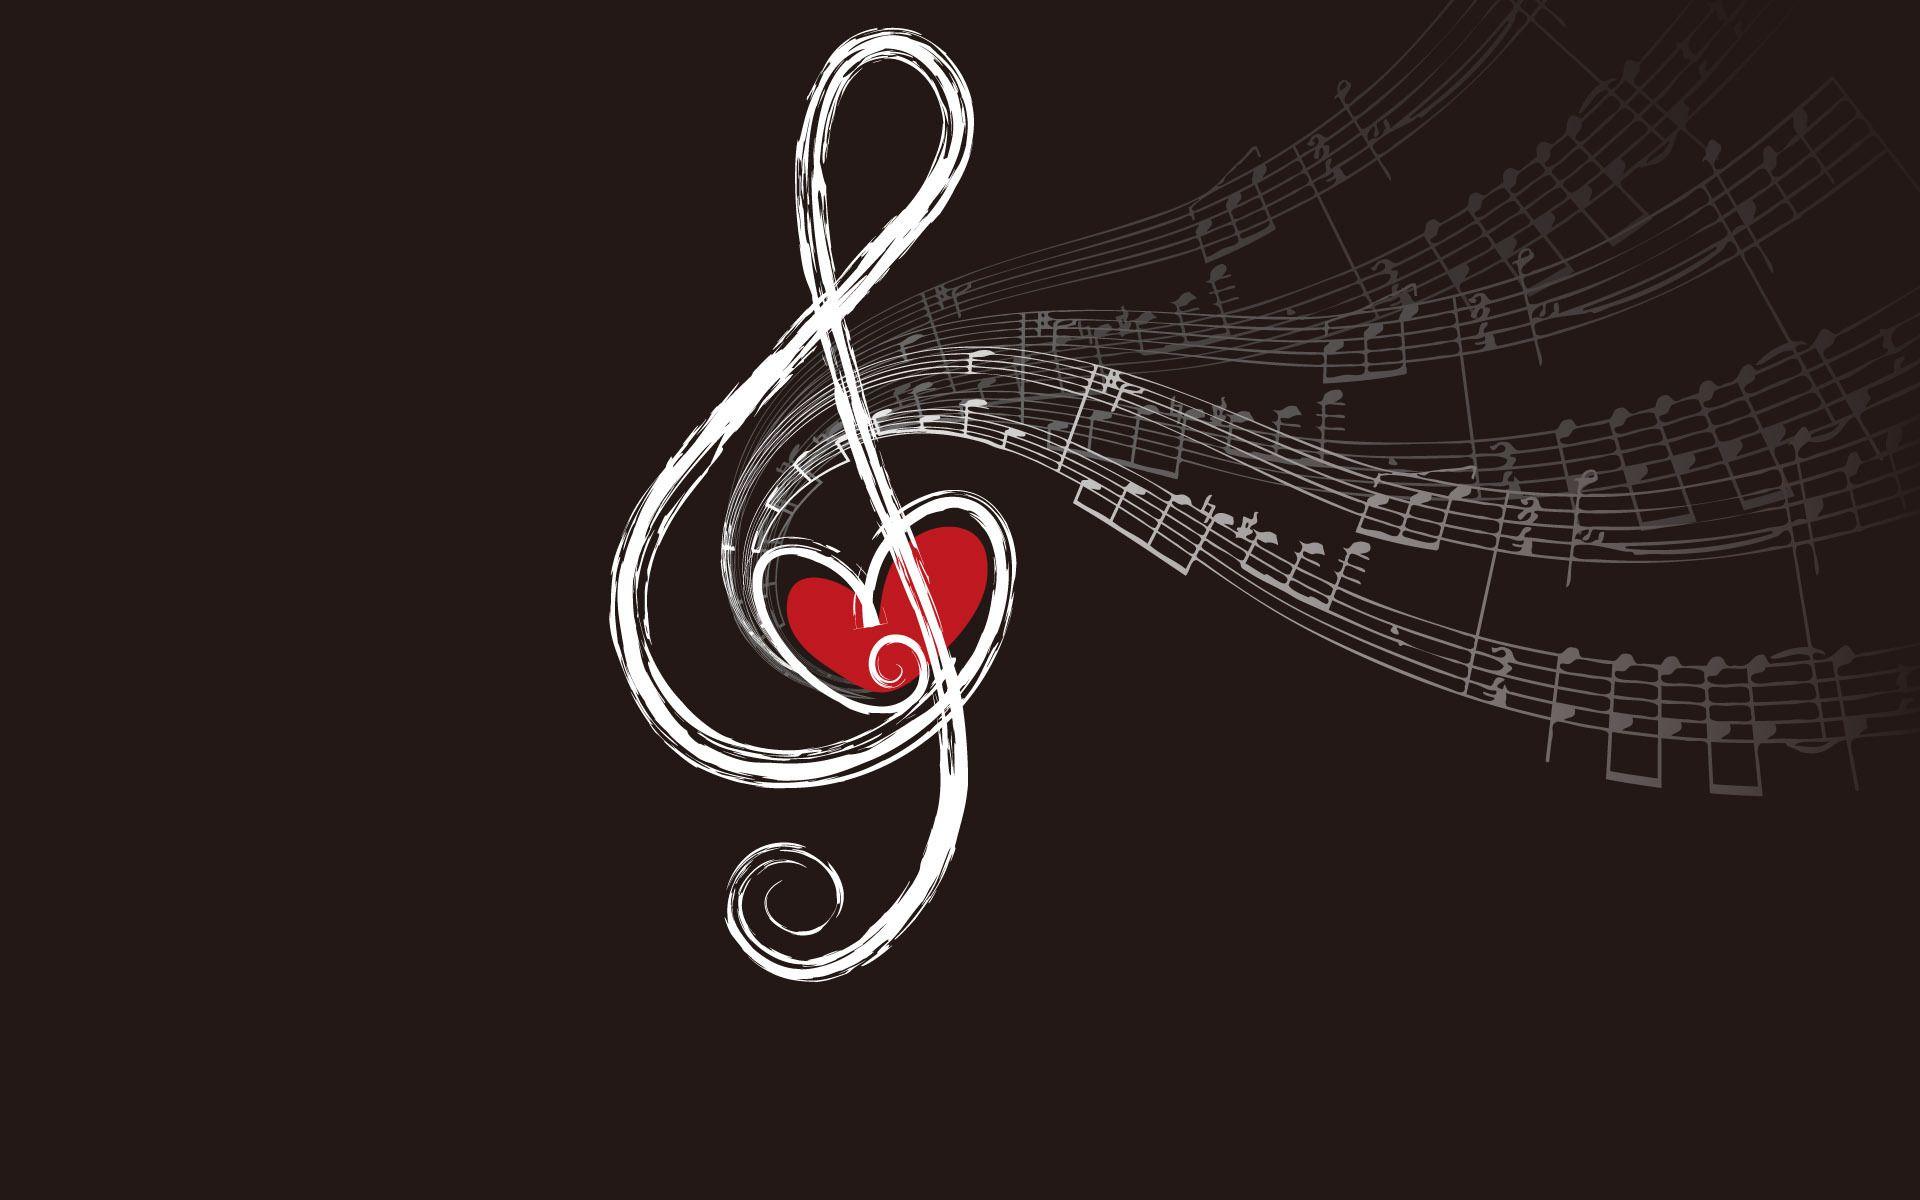 music background Music wallpaper, Music notes, Music